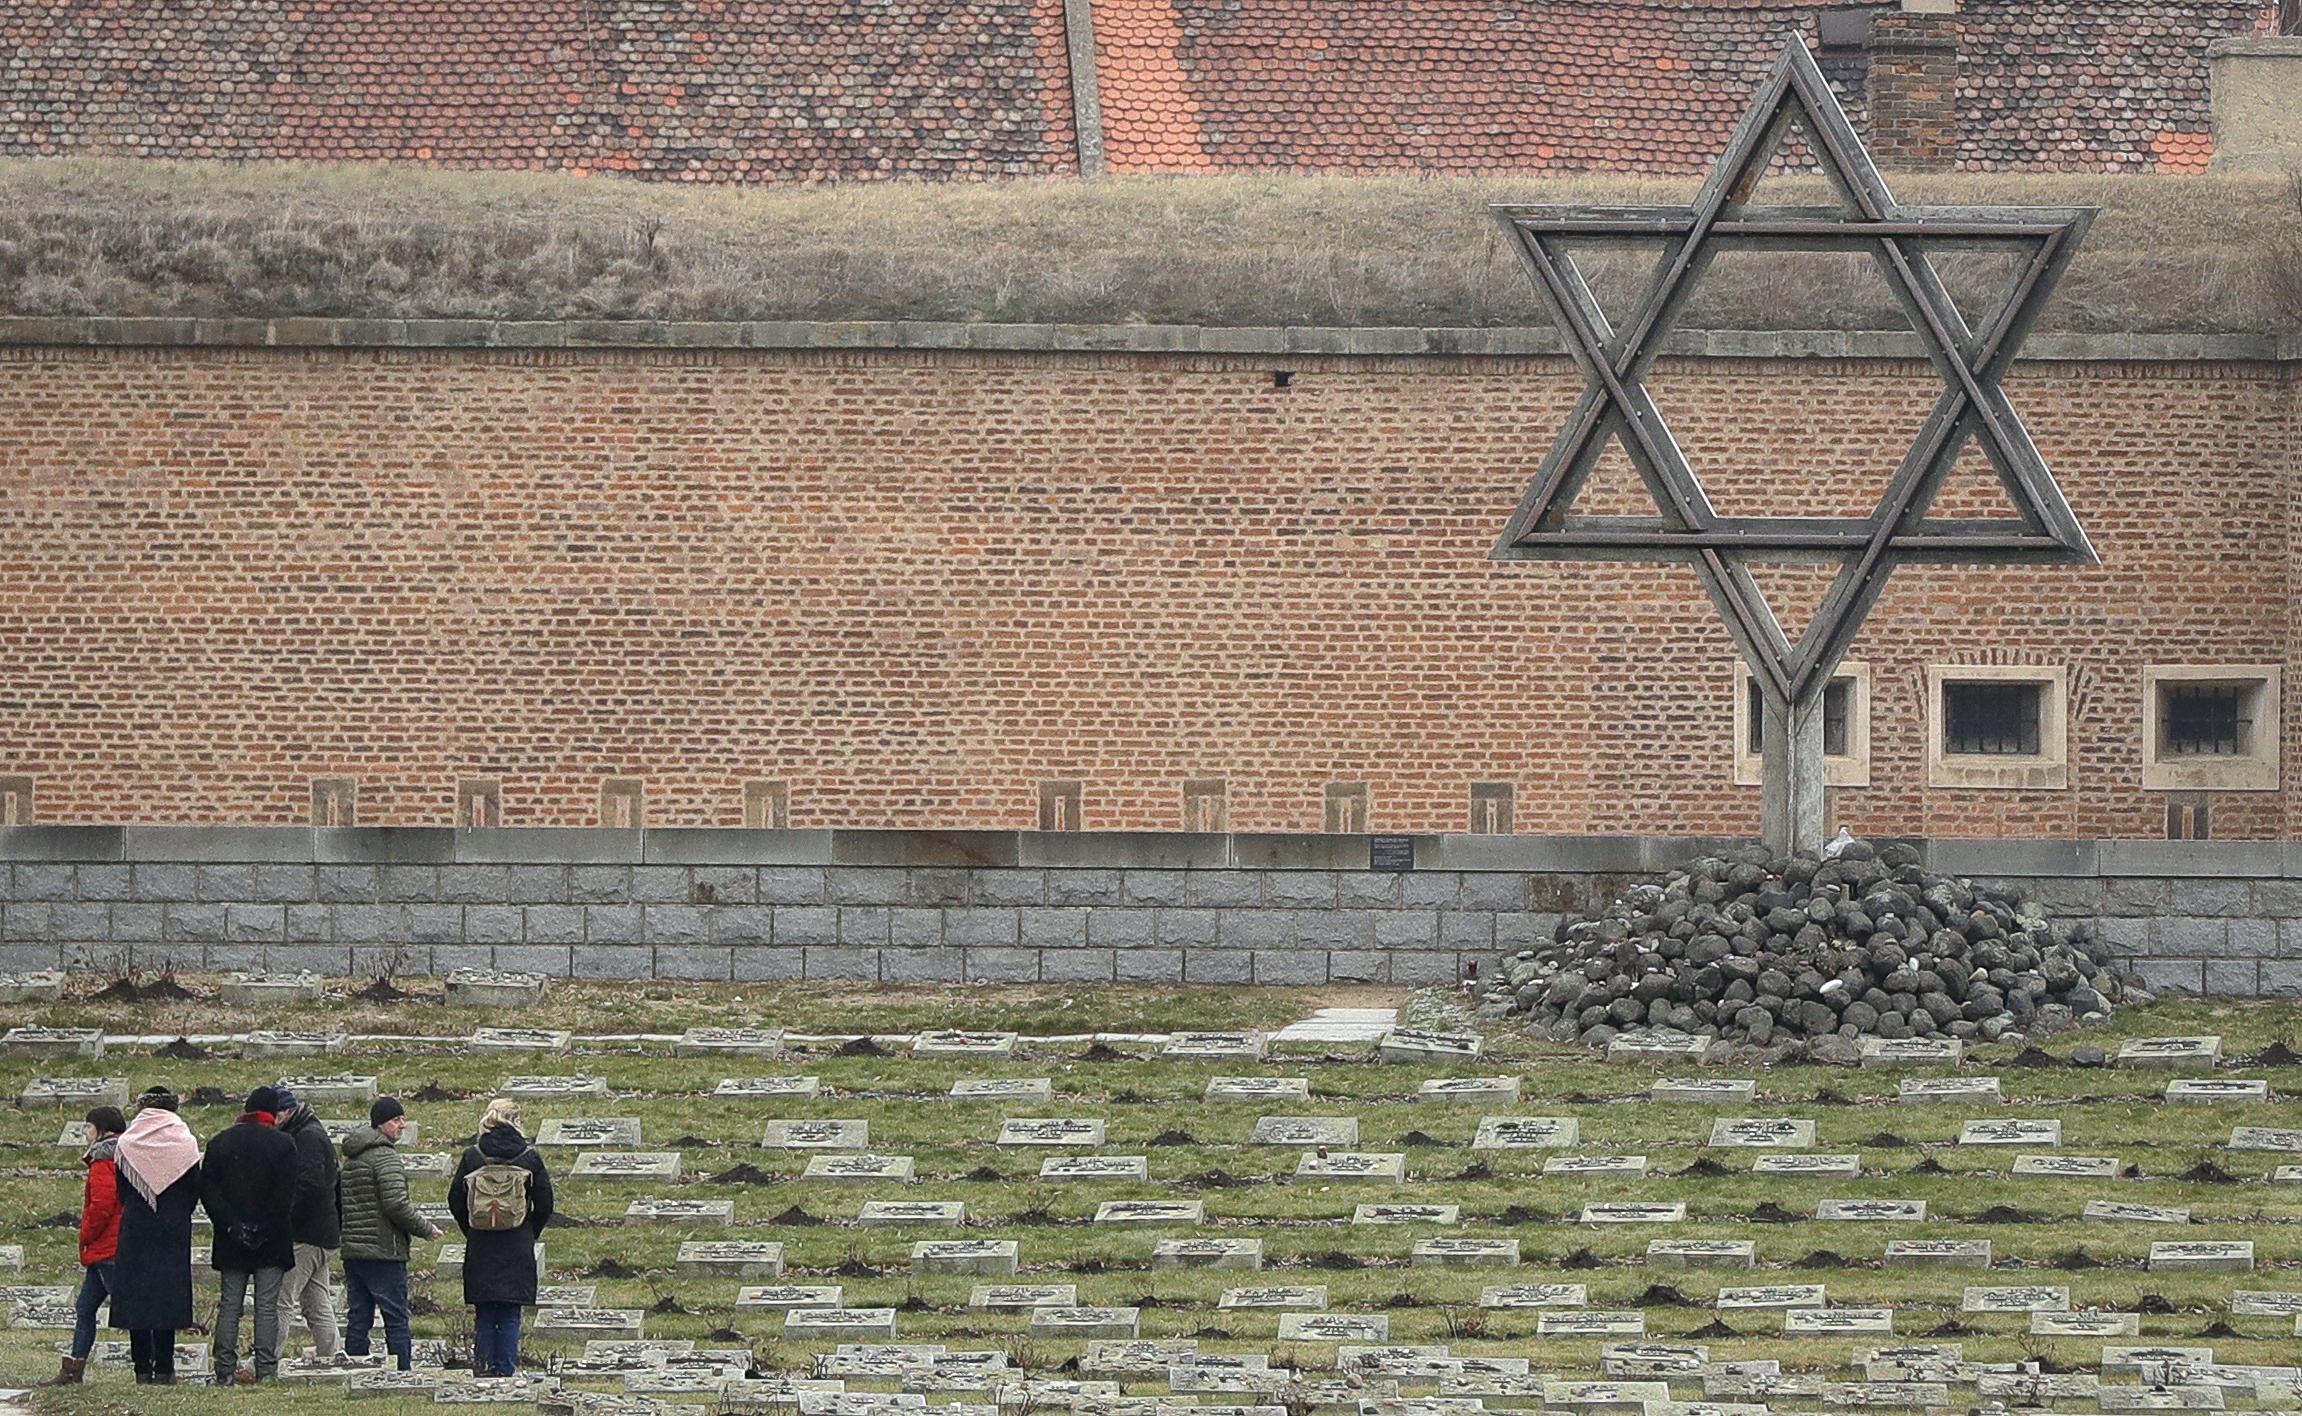 Czech_Republic_Holocaust_Photo_Gallery_33114-159532.jpg66945077